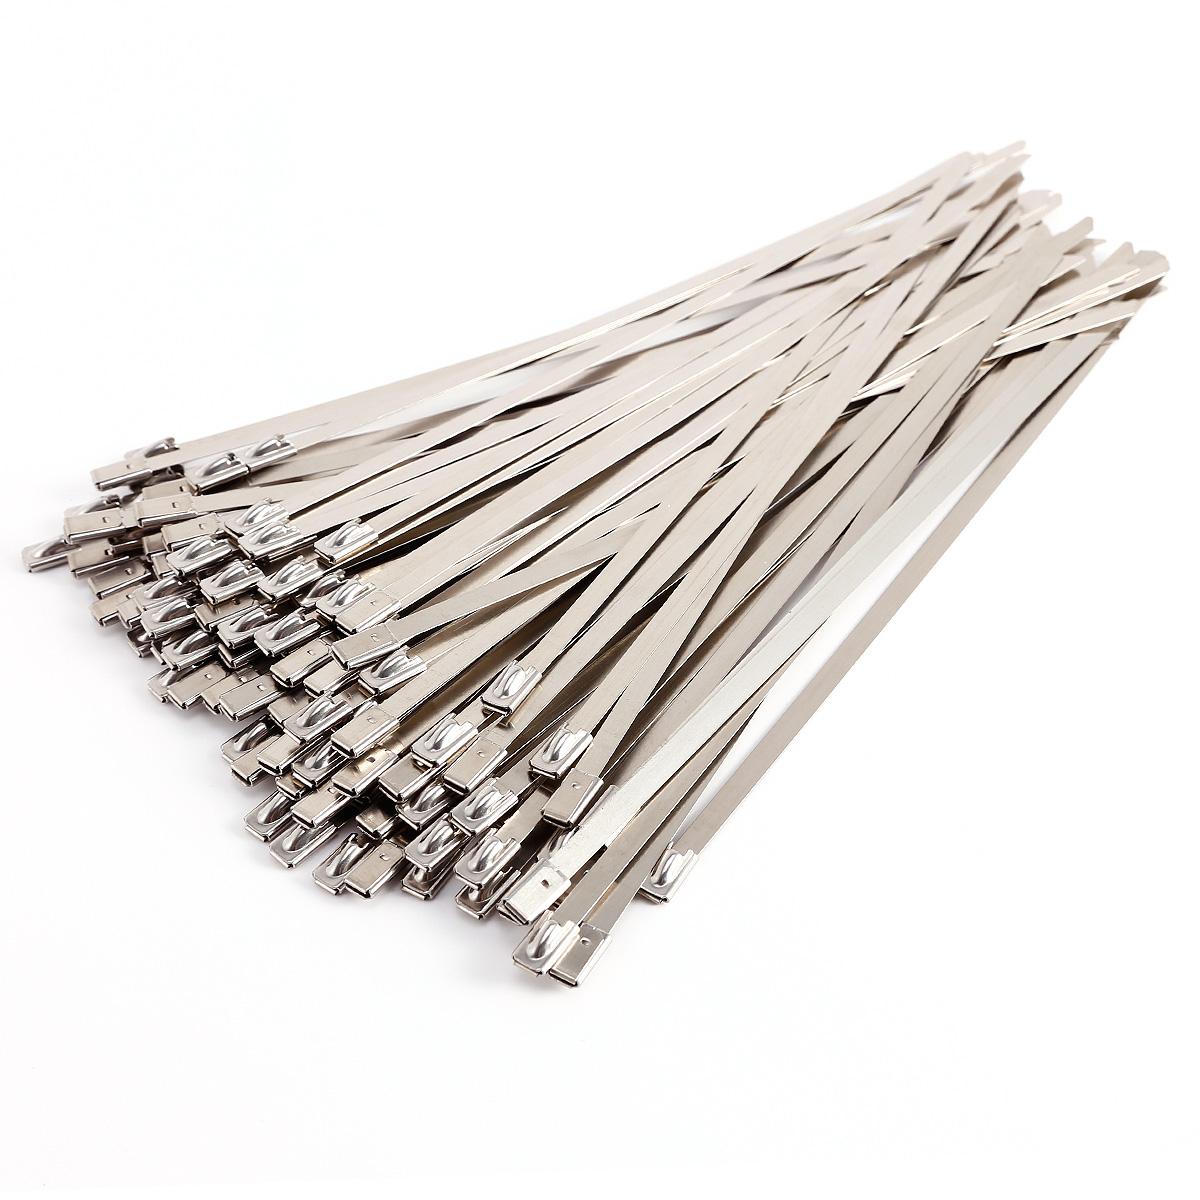 100pcs 2 5cm Stainless Steel Metal Cable Wire Ties Zip Tie